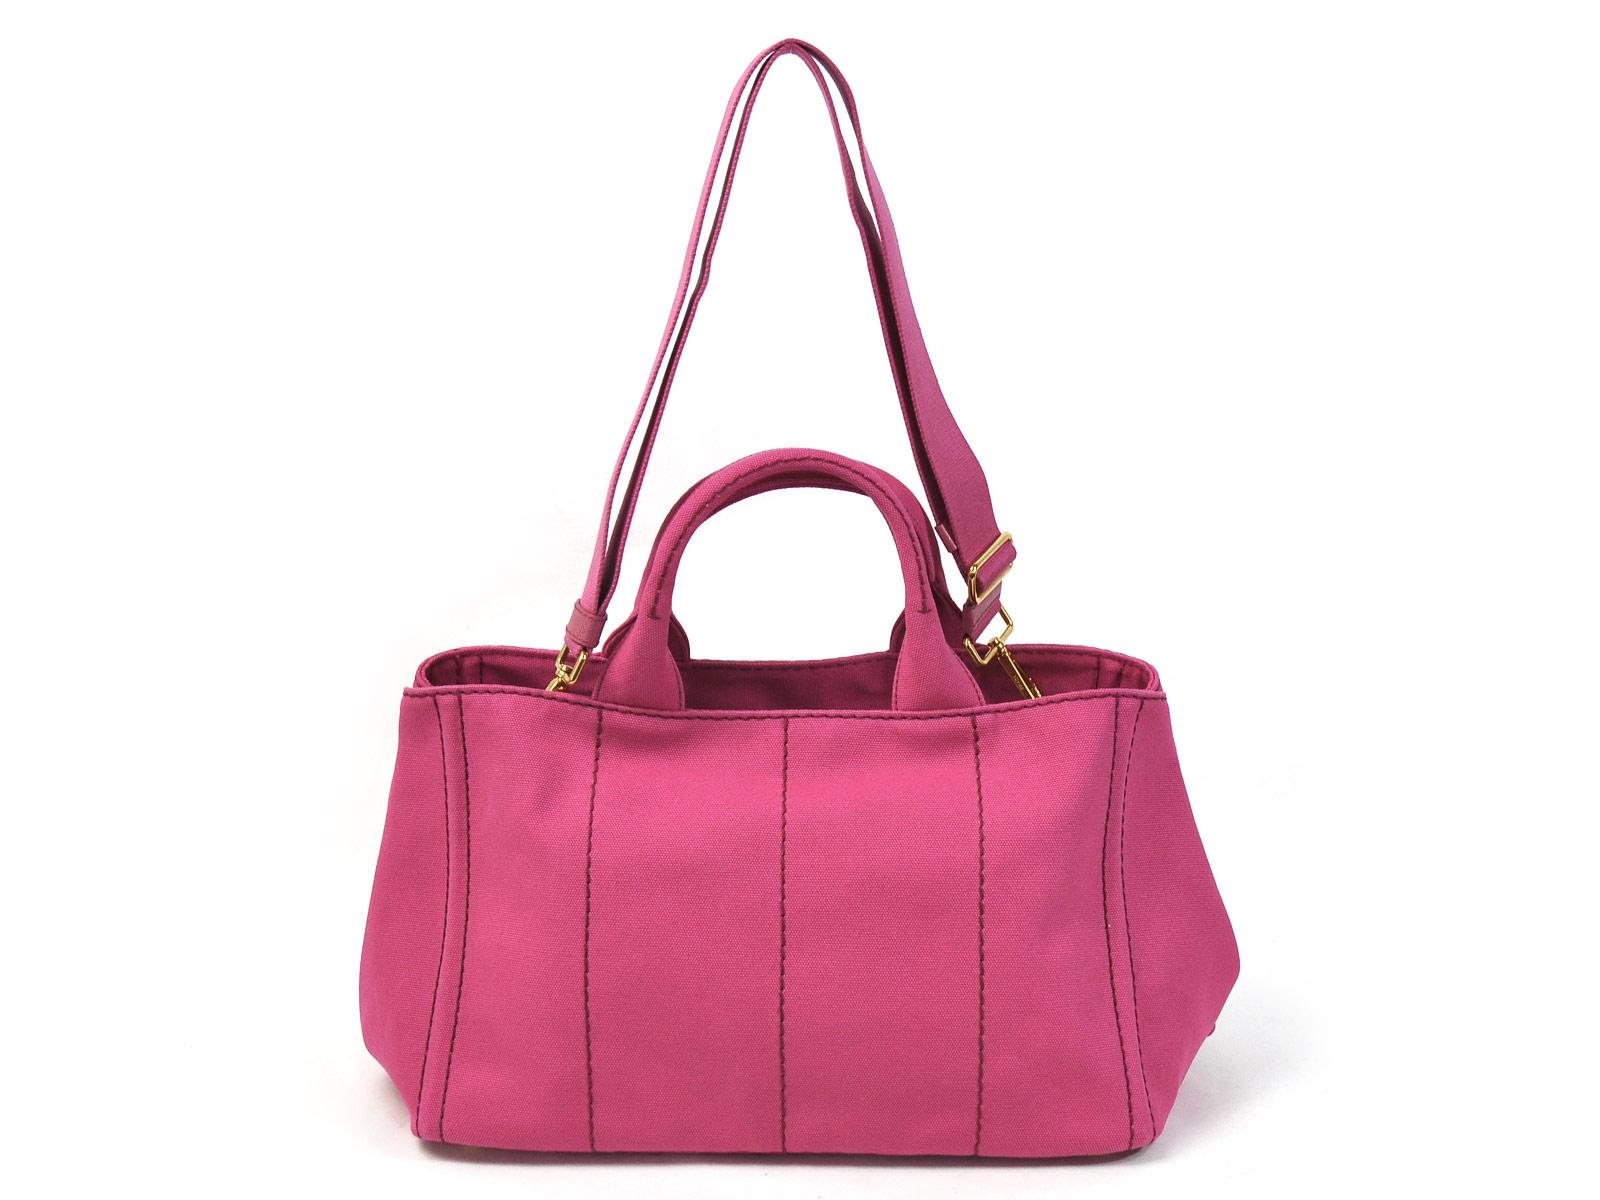 7a8e1f9383f415 Pink Prada Bag Ebay. 37028 auth PRADA raspberry pink leather DOUBLE ZIP Tote  ...